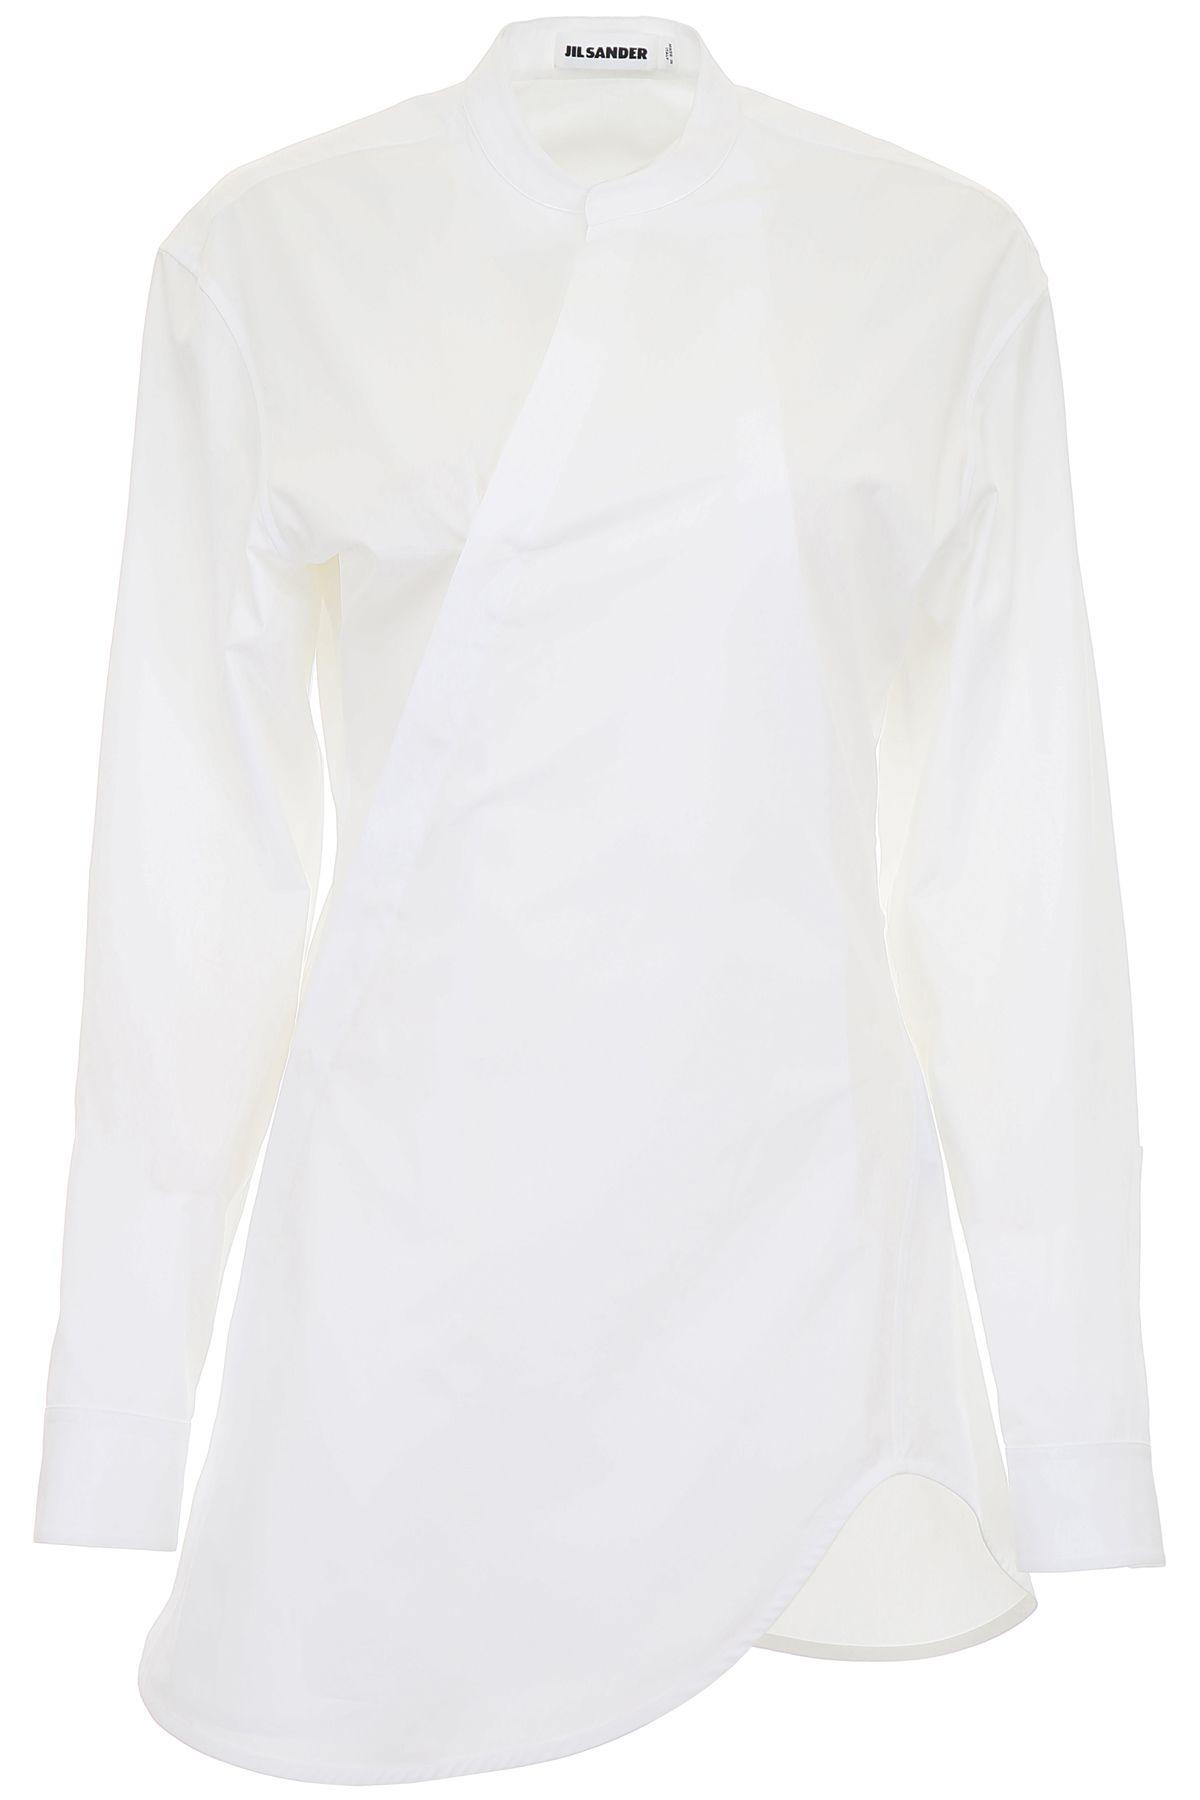 Jil Sander Shirt With Side Button Closure